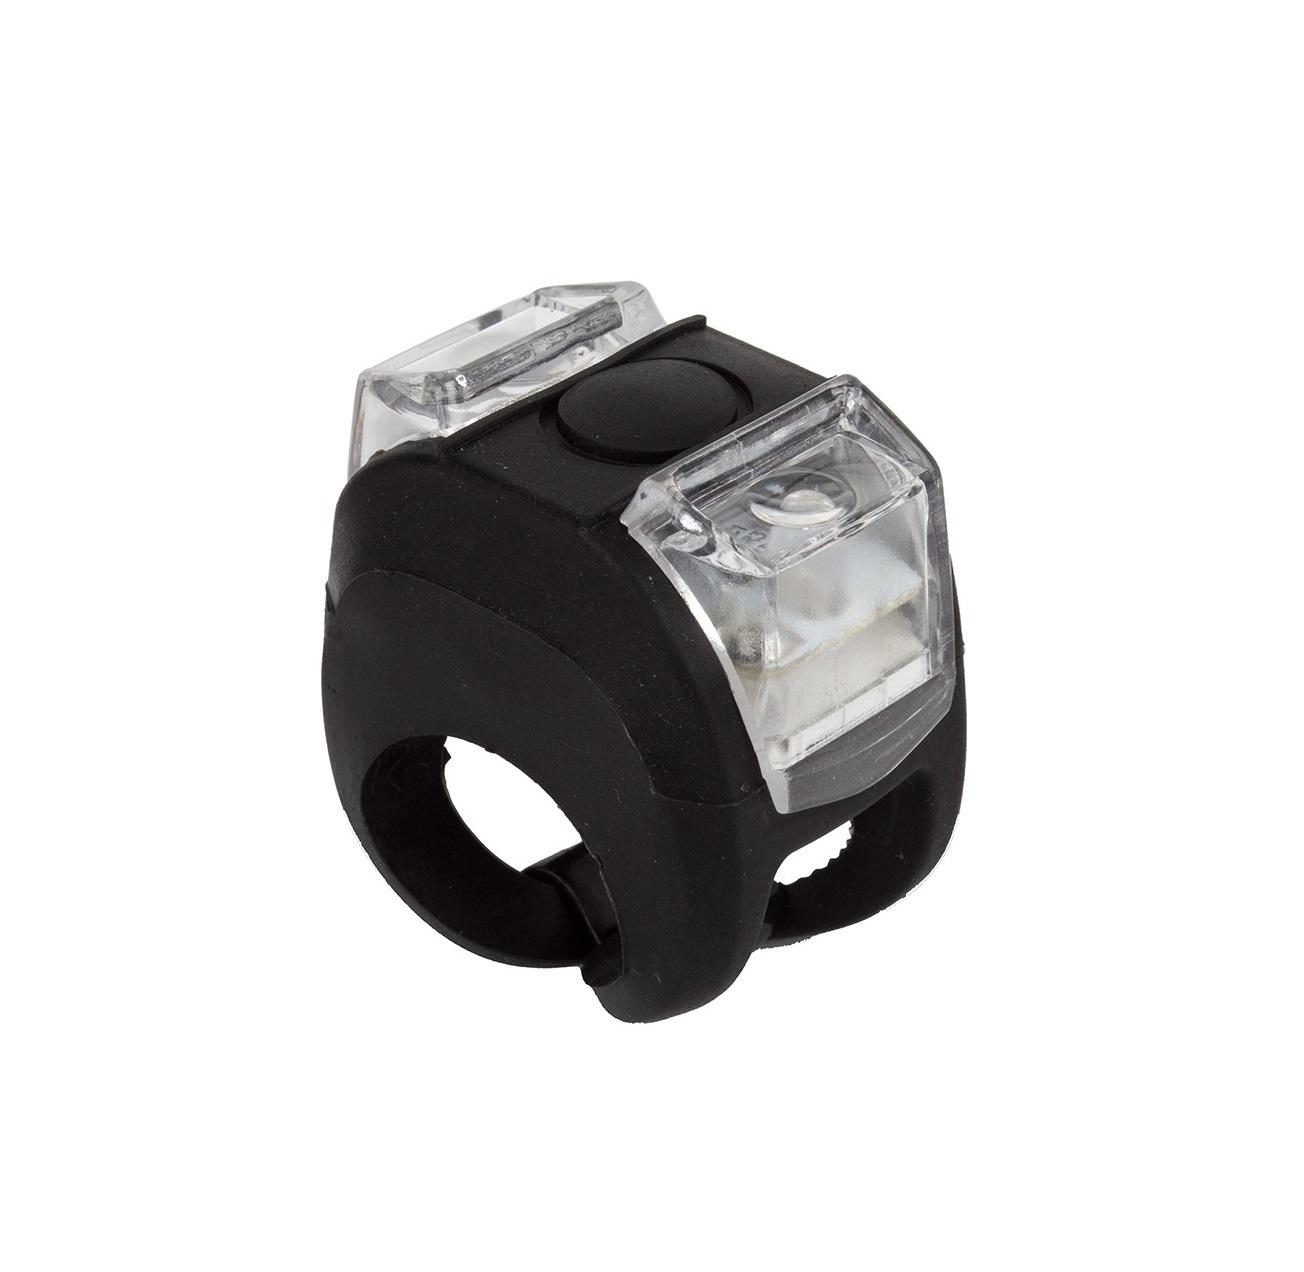 Sunlite Omnigrip Headlight Battery Powered